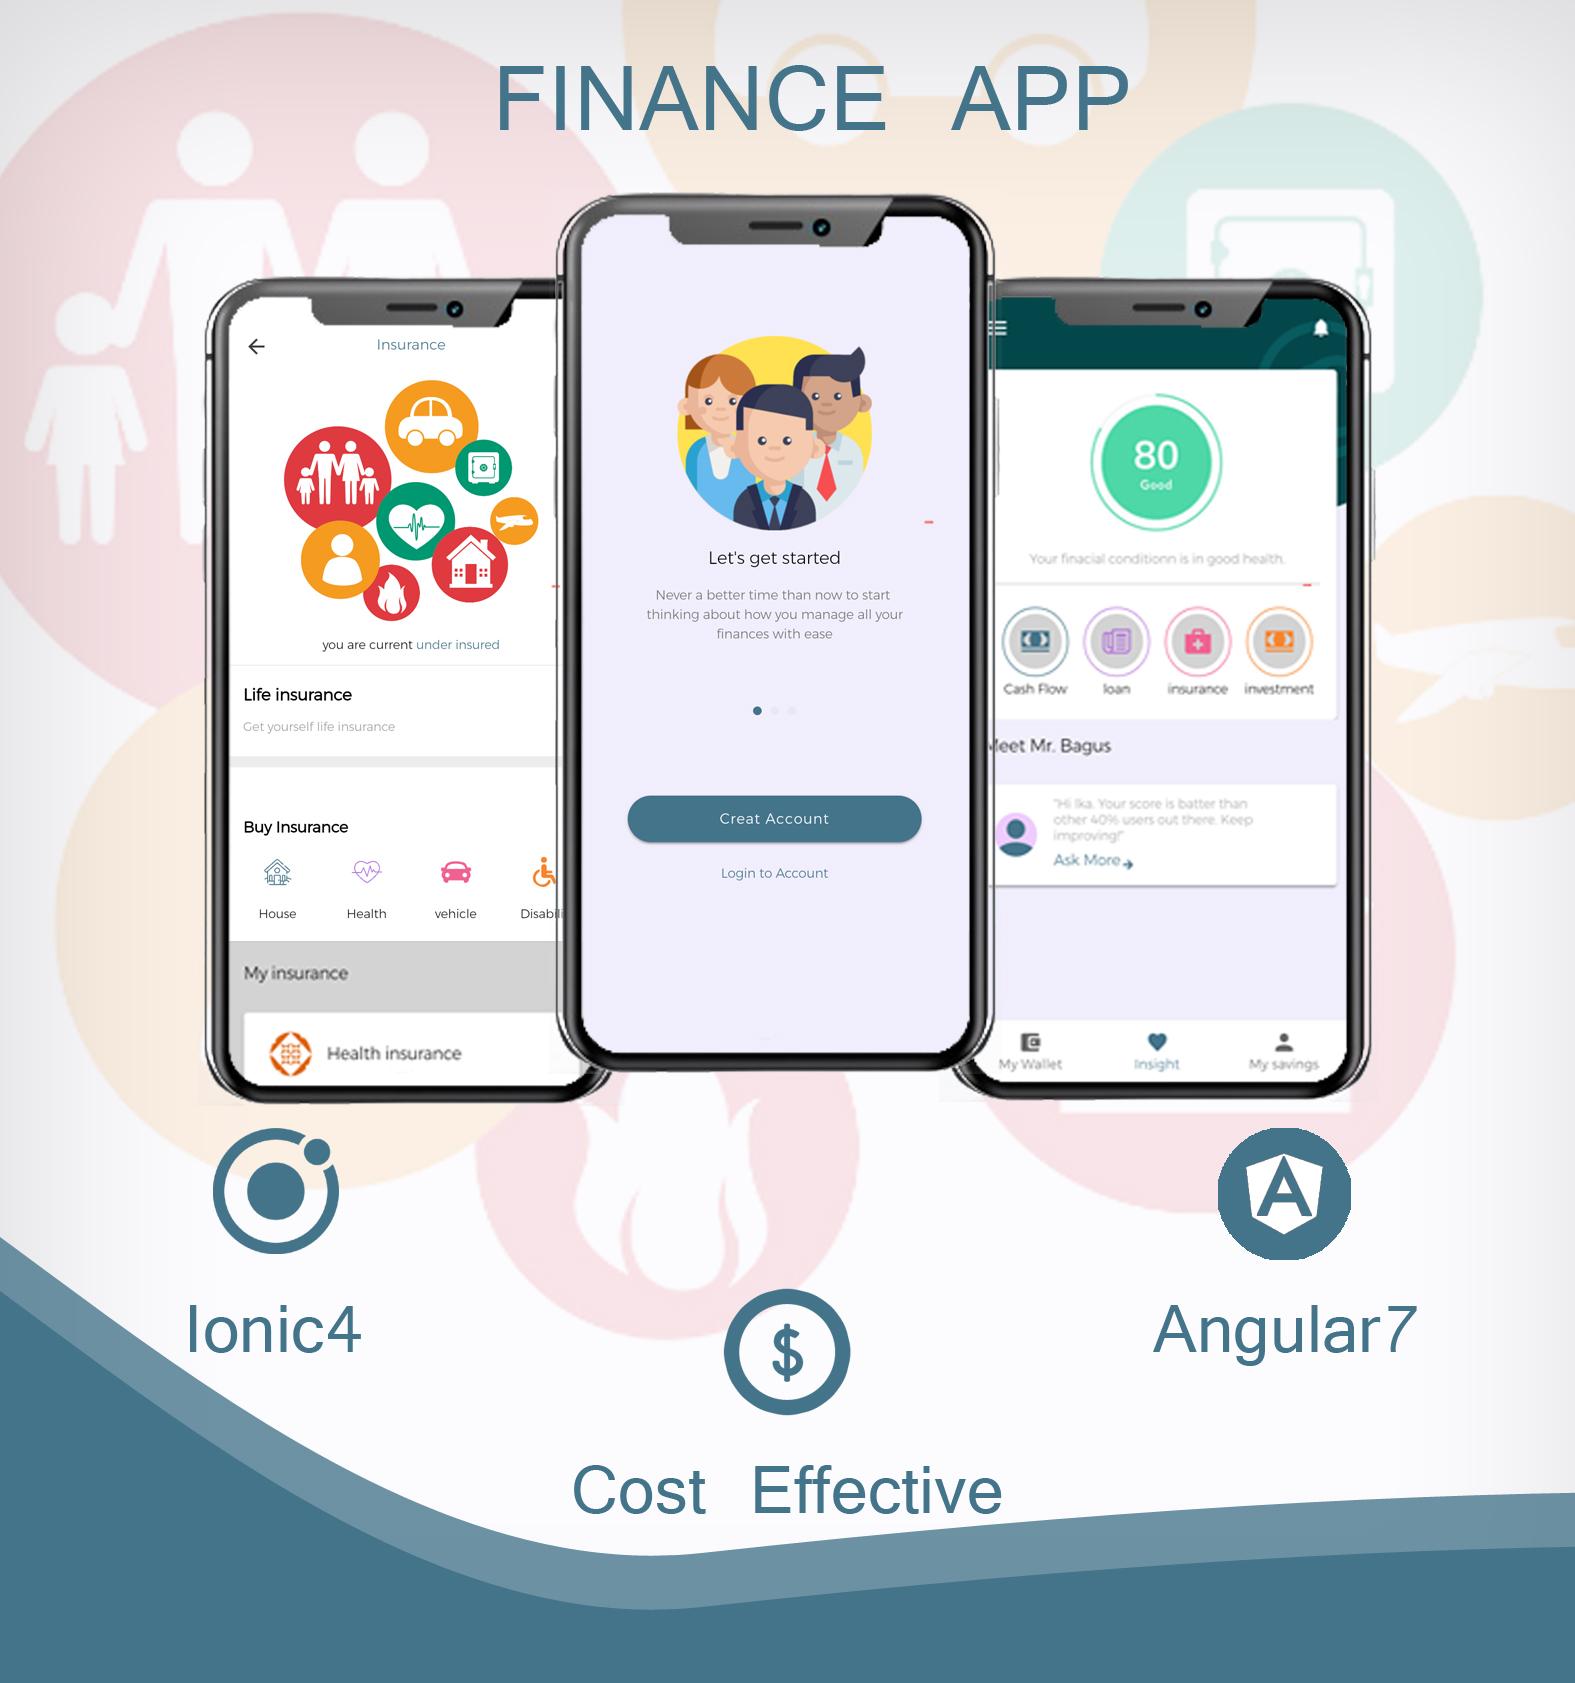 Finance app ionic